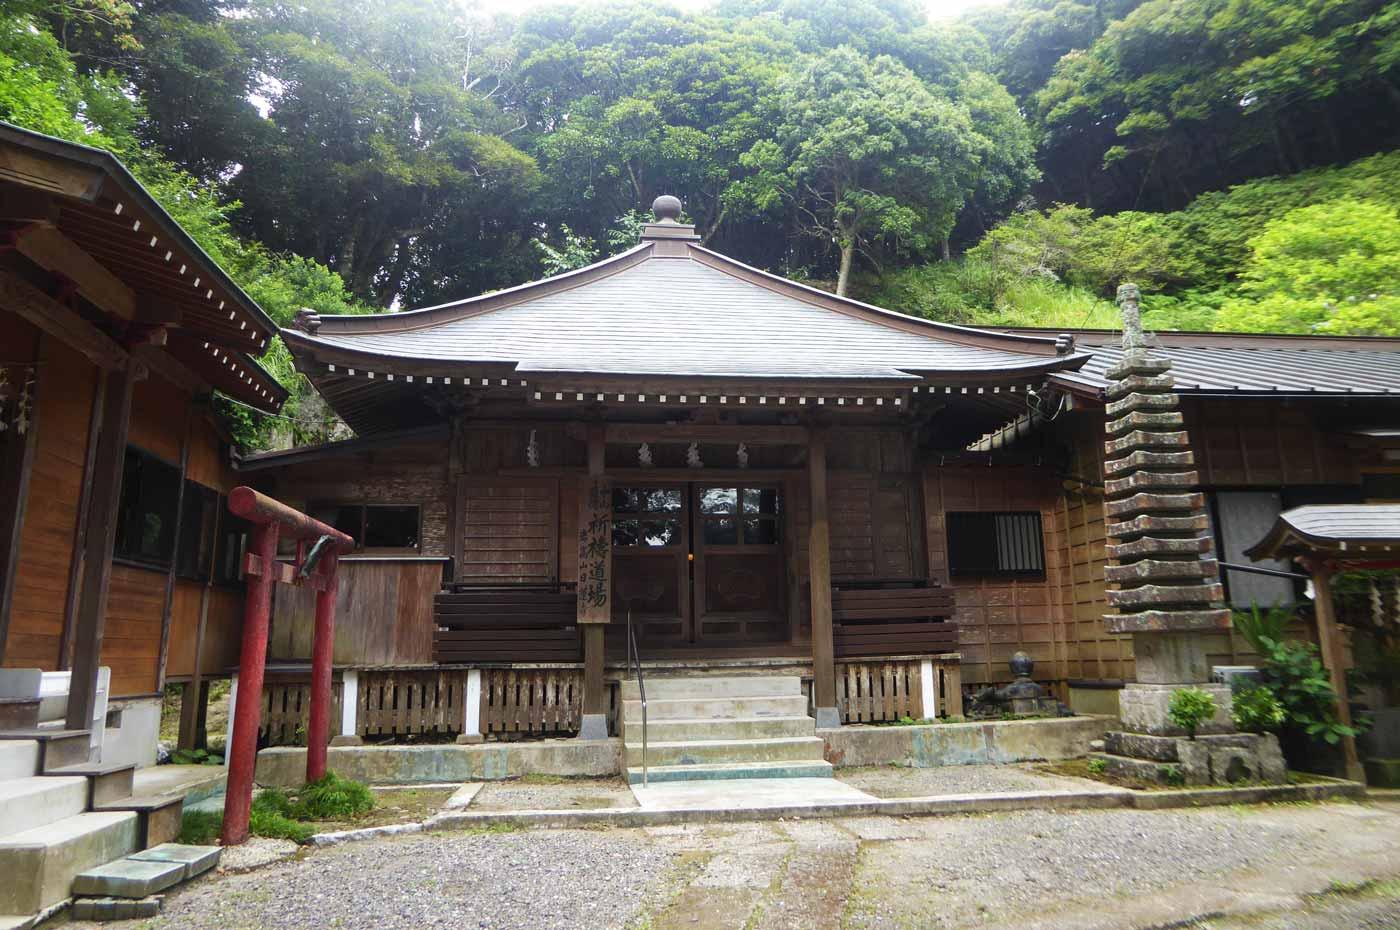 岩高山日蓮寺の境内